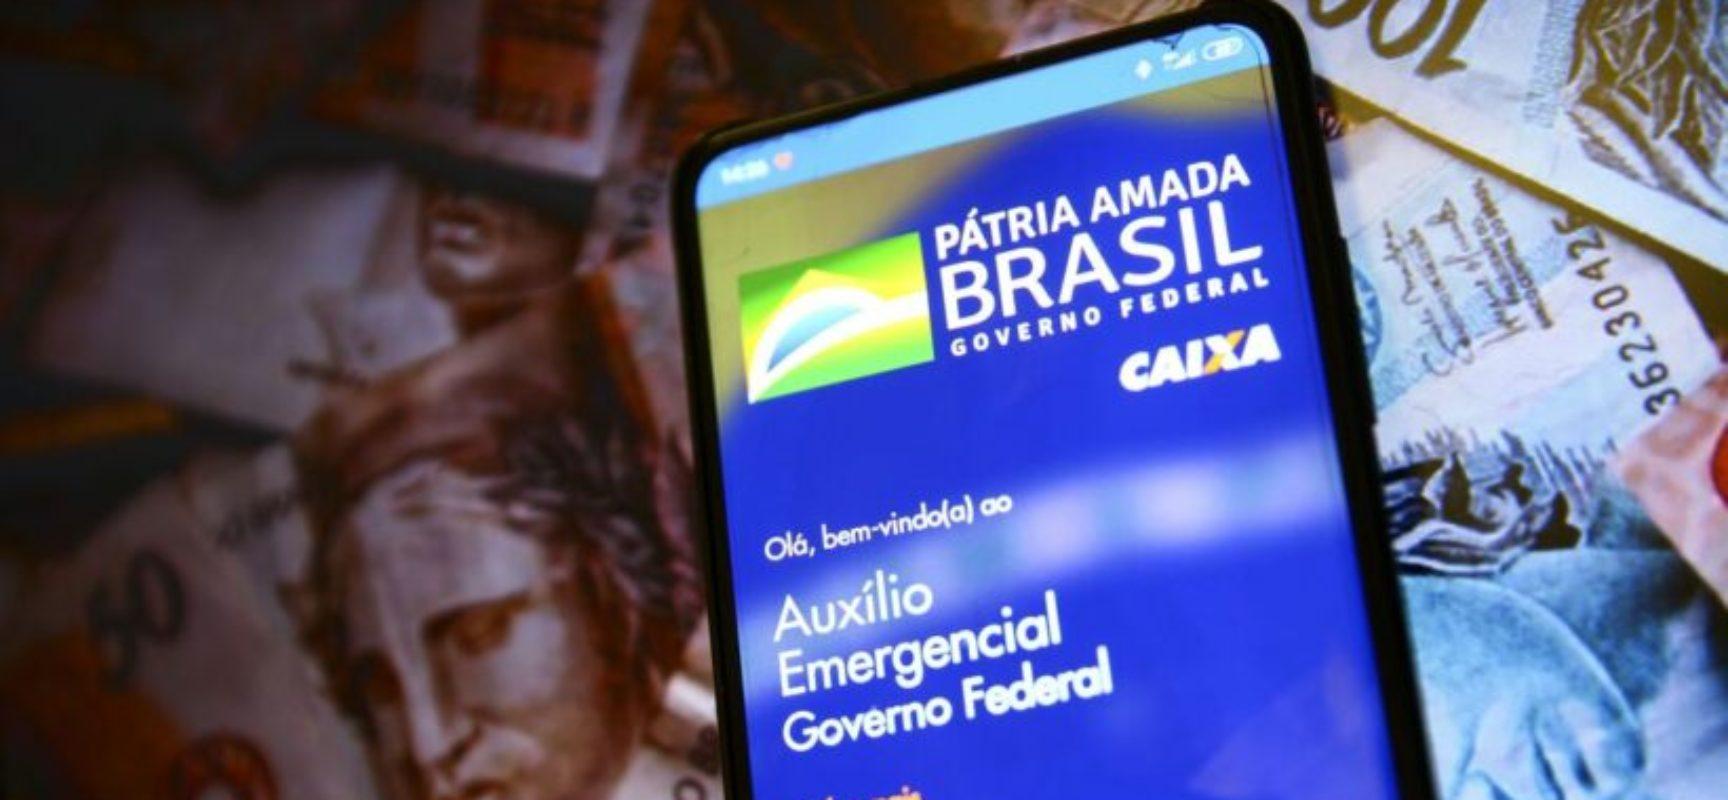 Paulo Guedes afirma que auxílio emergencial ficará entre R$ 175 a R$ 375